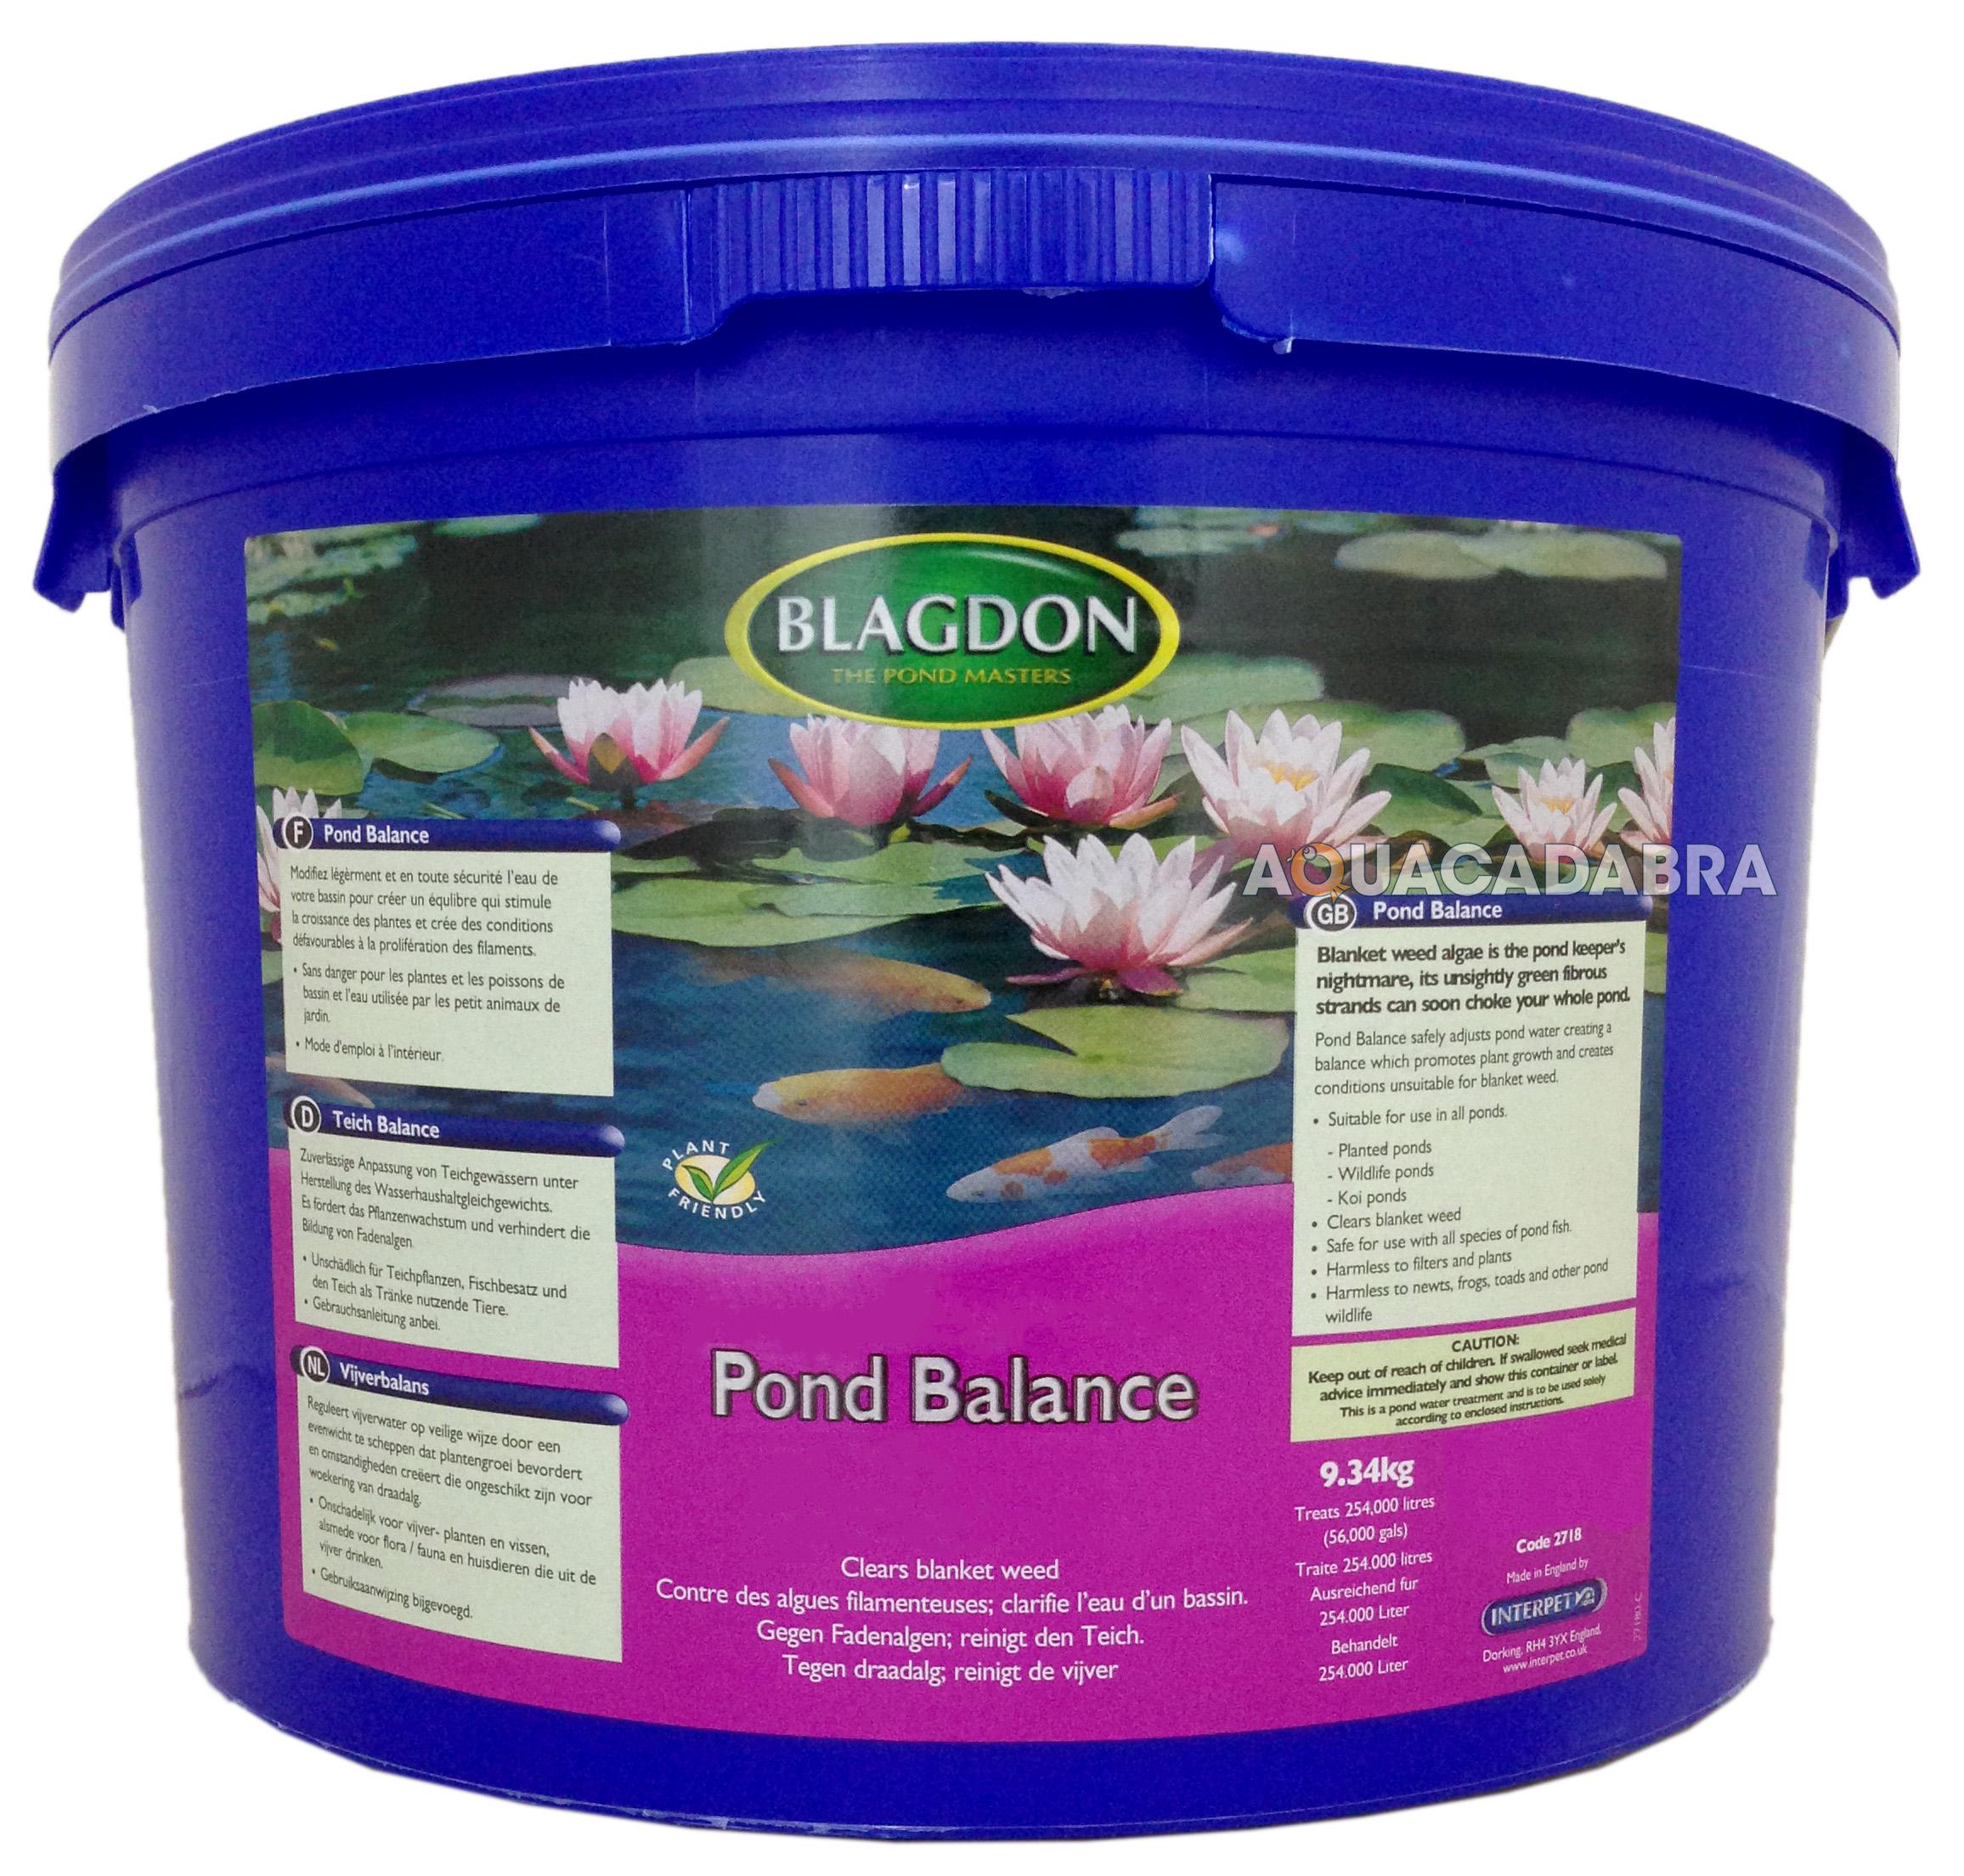 Blagdon pond balance 1500 3000 9000 56000 gallon fish for 1500 gallon koi pond